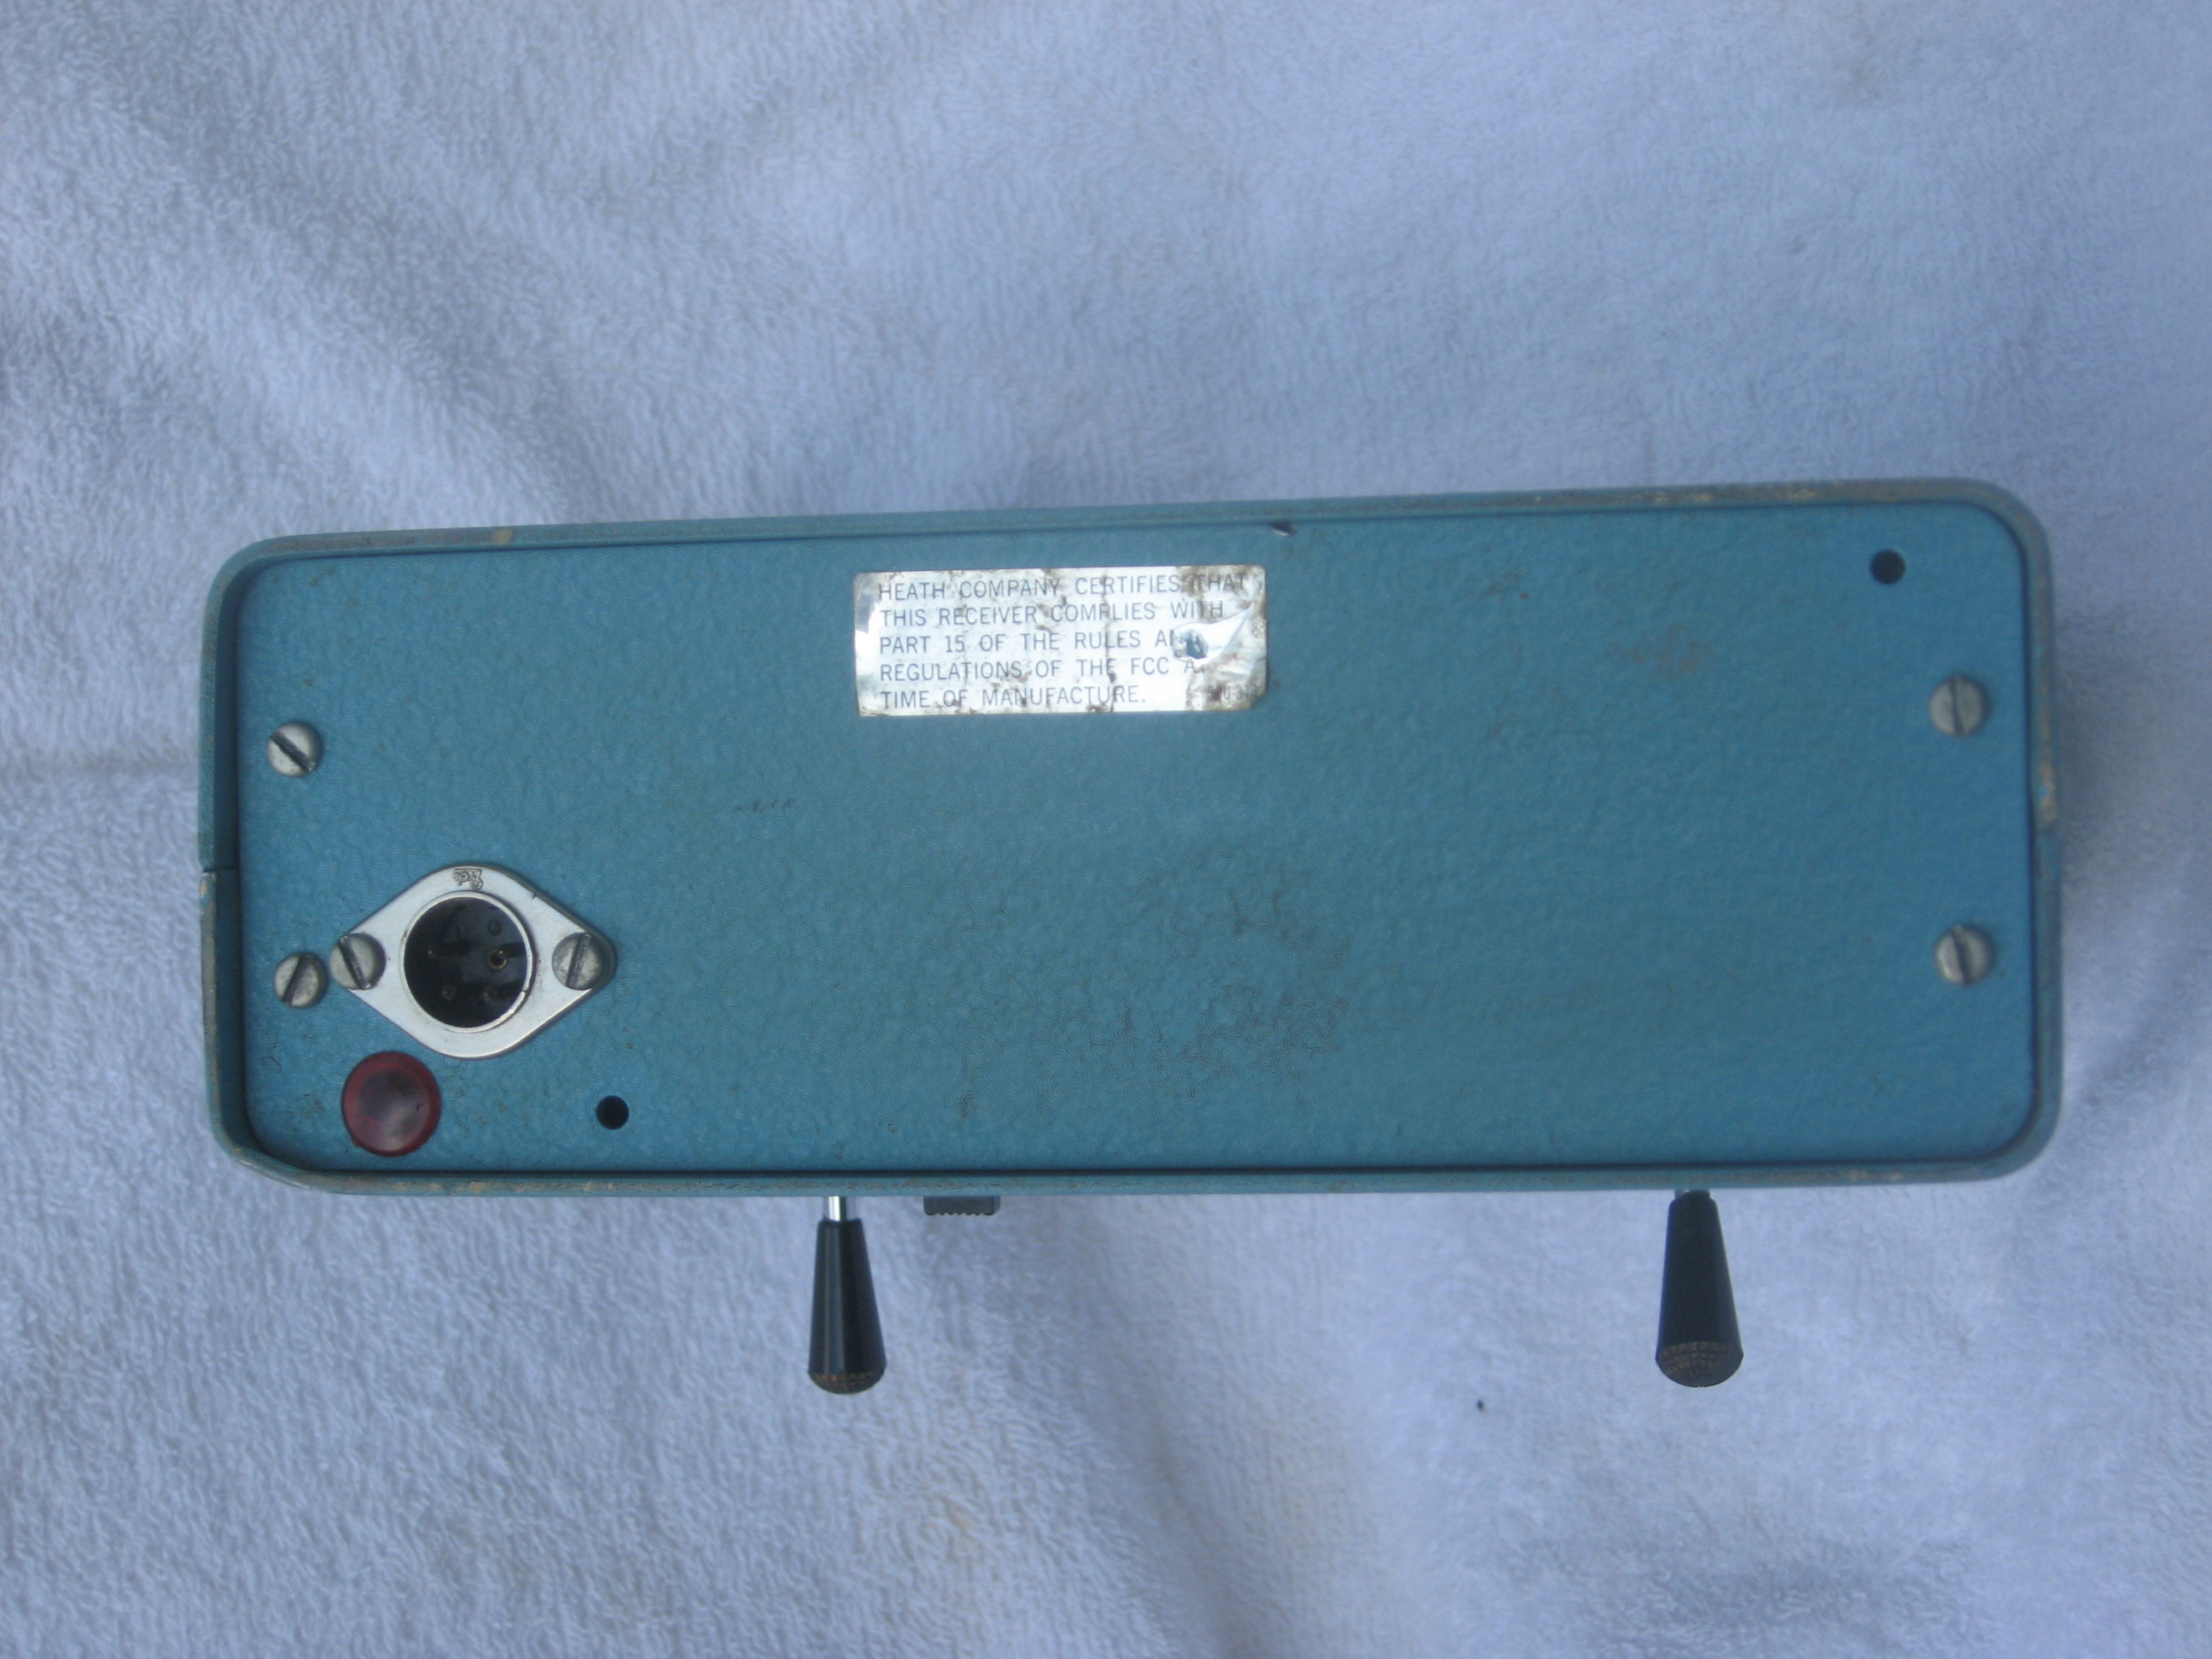 Who here built a Heathkit R/C radio? - RCU Forums